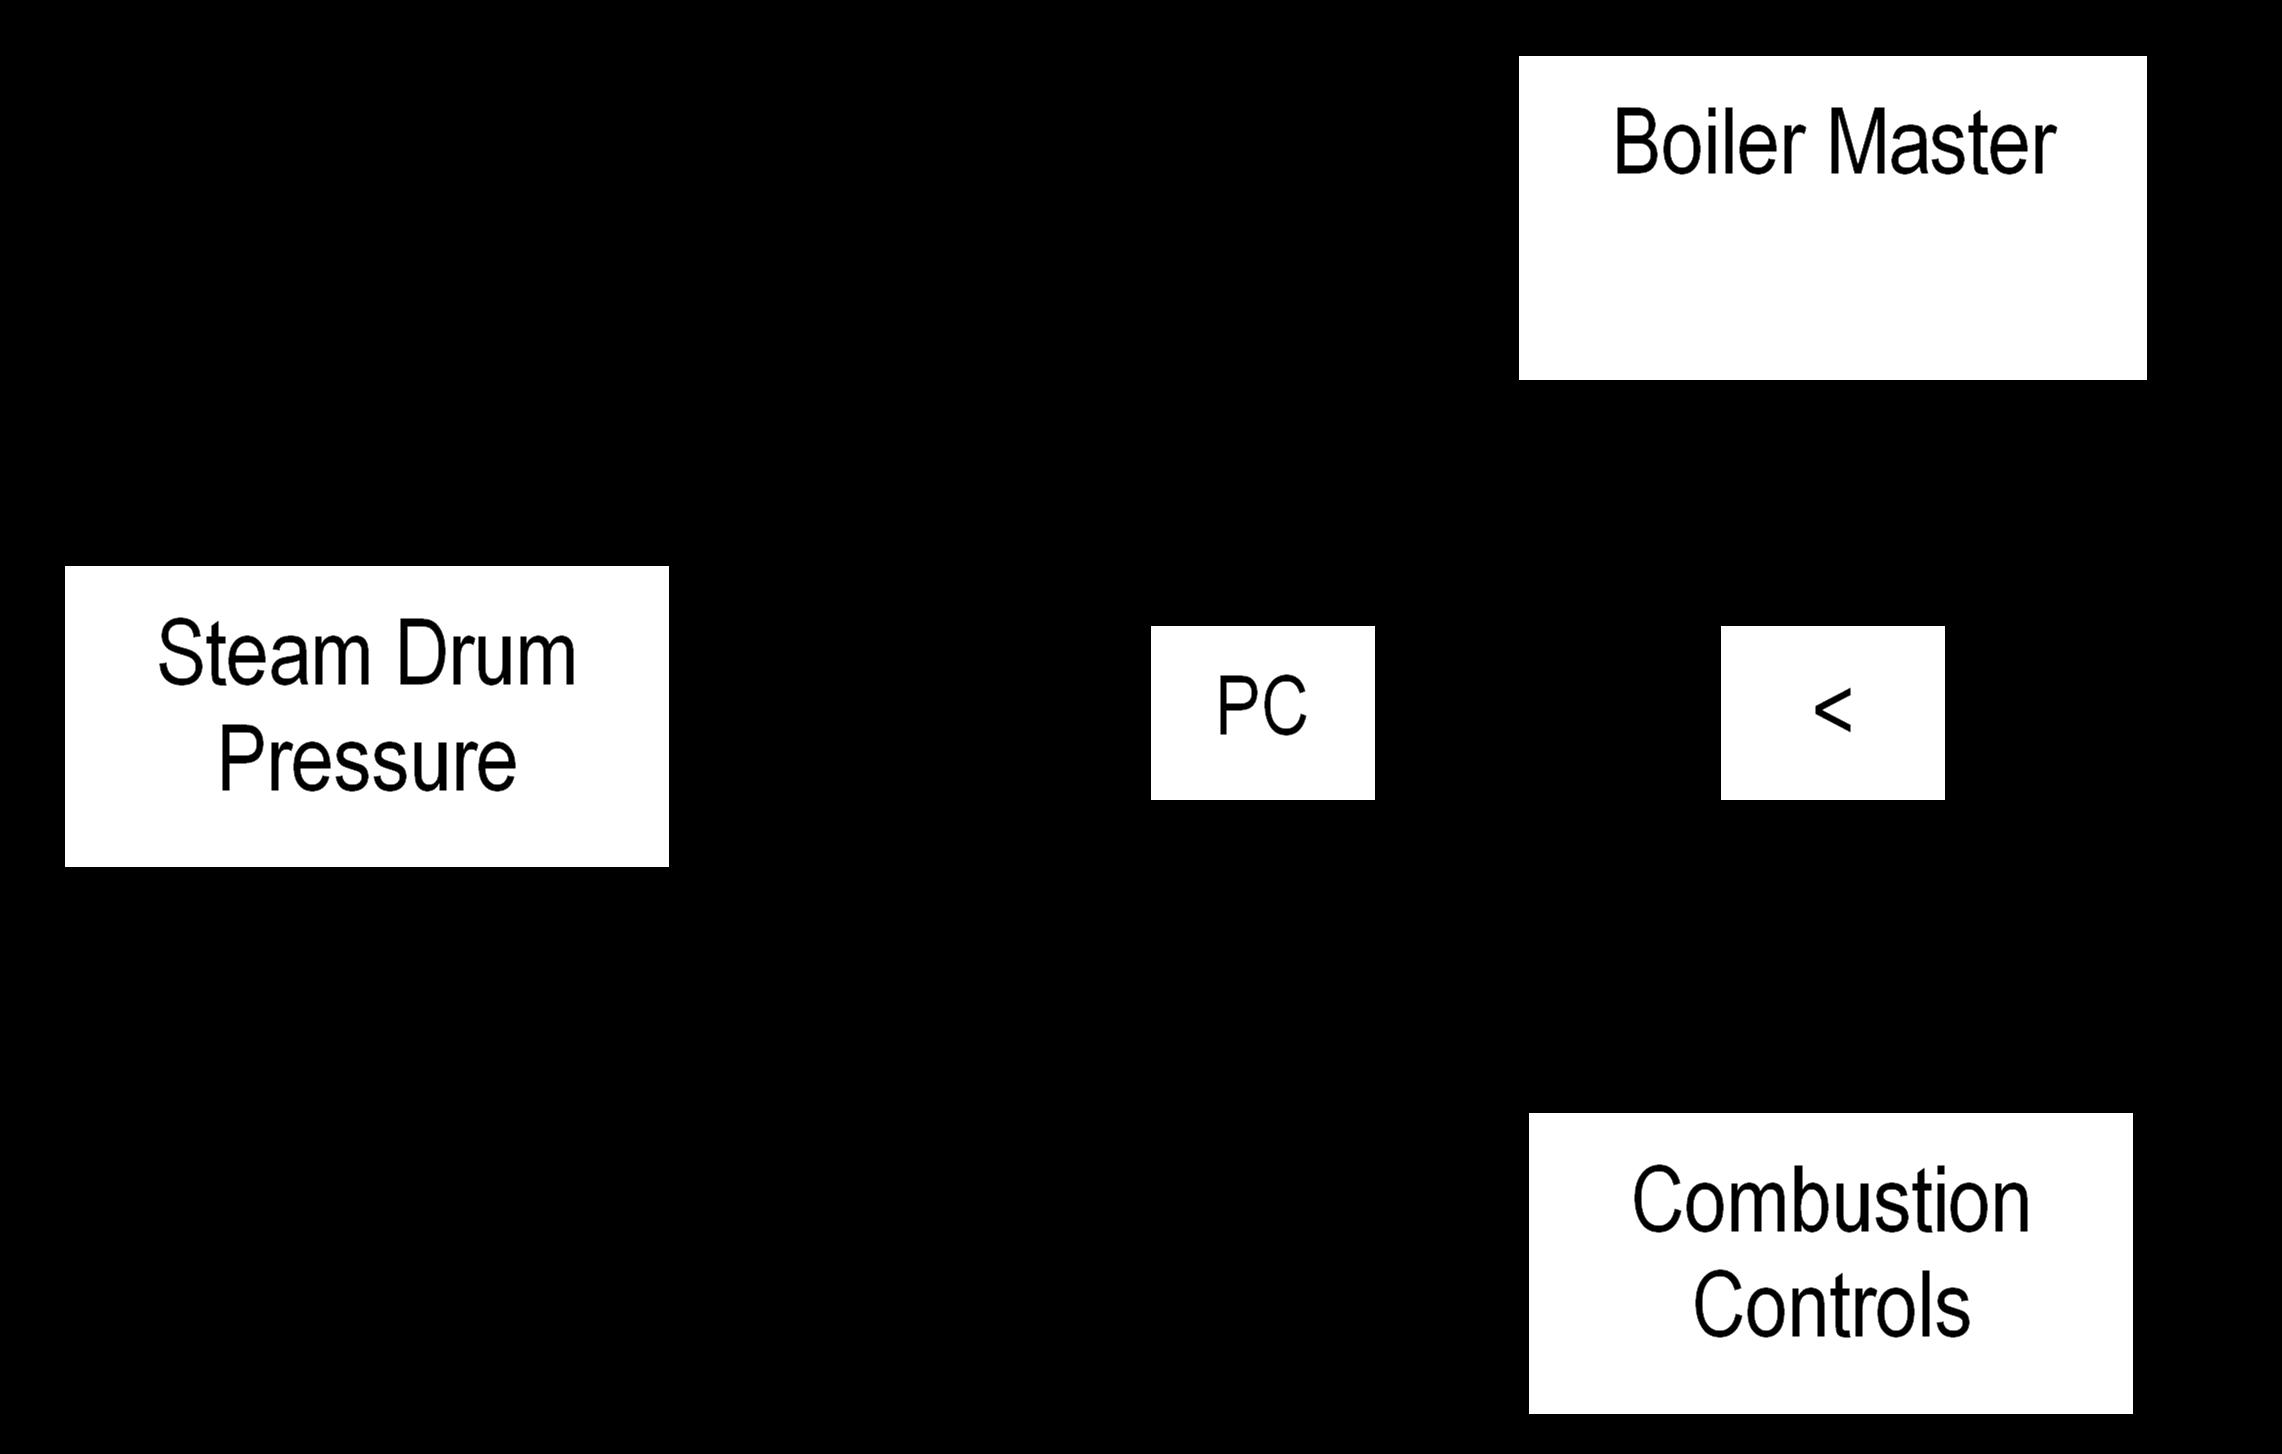 Figure 10 Boiler Master Overrides